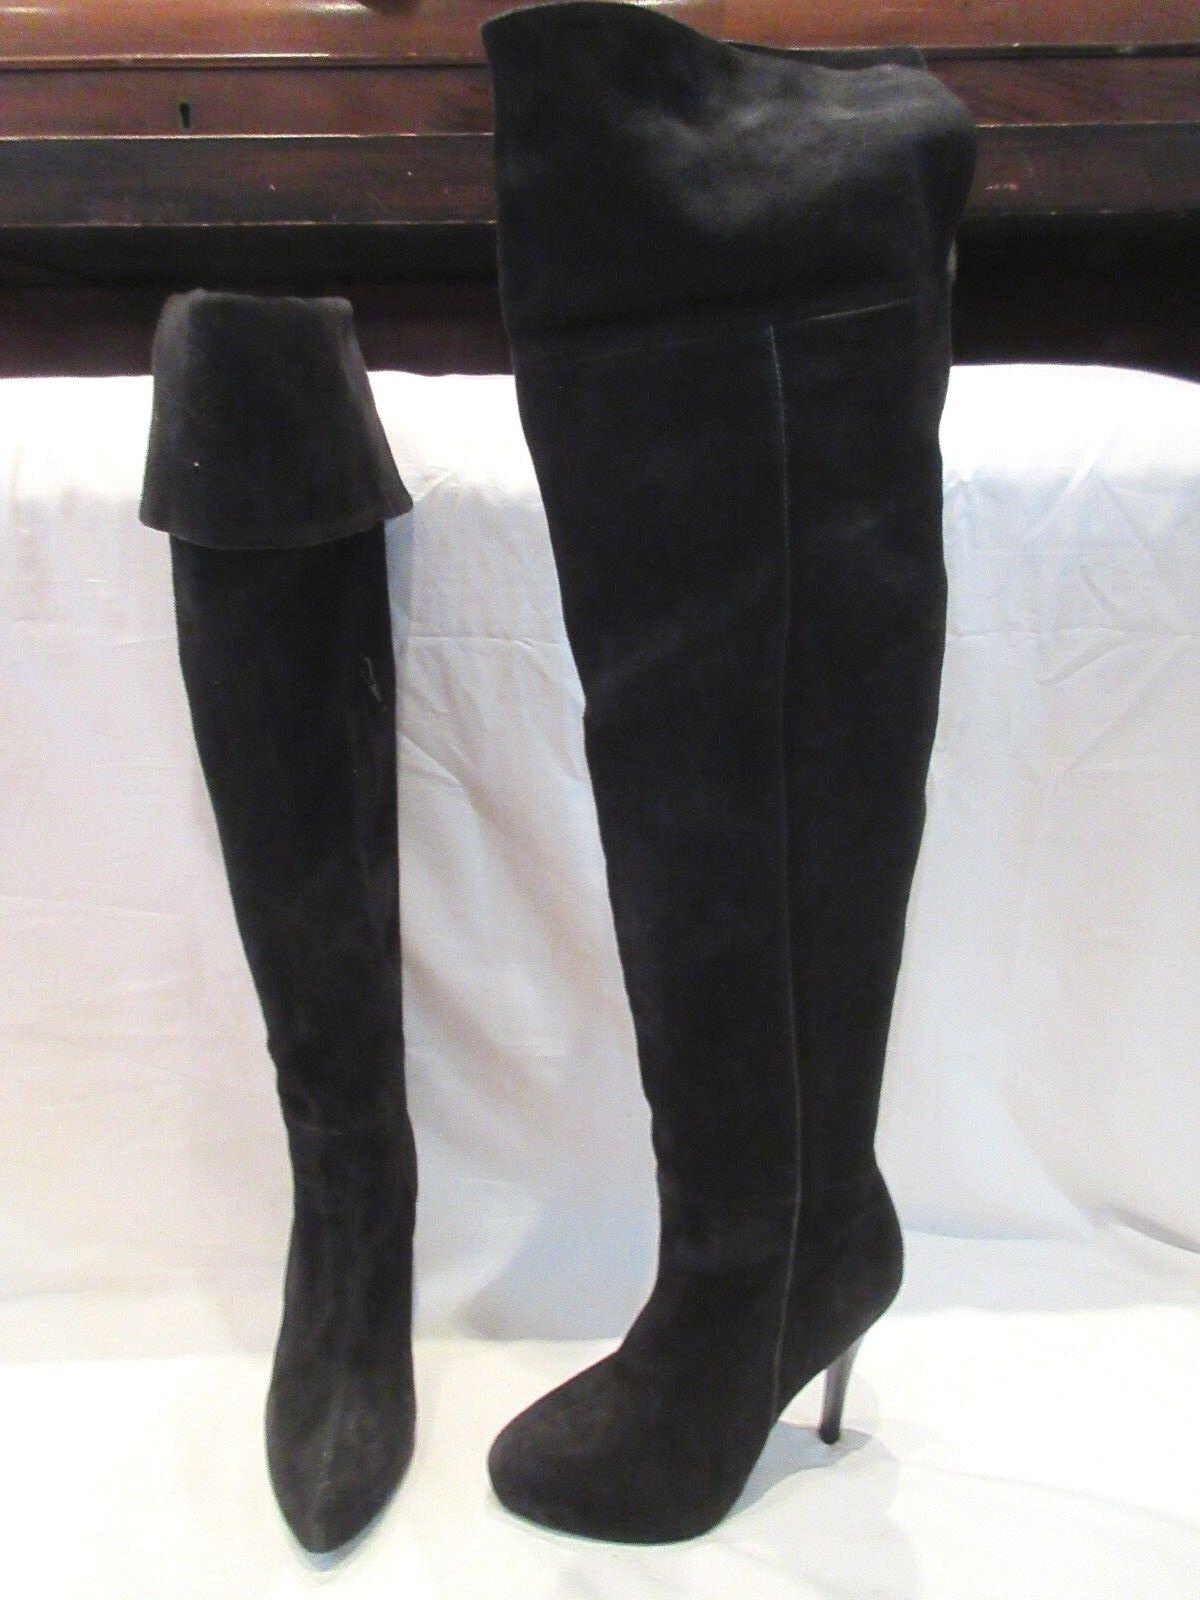 MODA IN PELLE BLACK SUEDE OVER KNEE PULL ON HIGH HEEL Stiefel UK 5 EU 38 (1663)